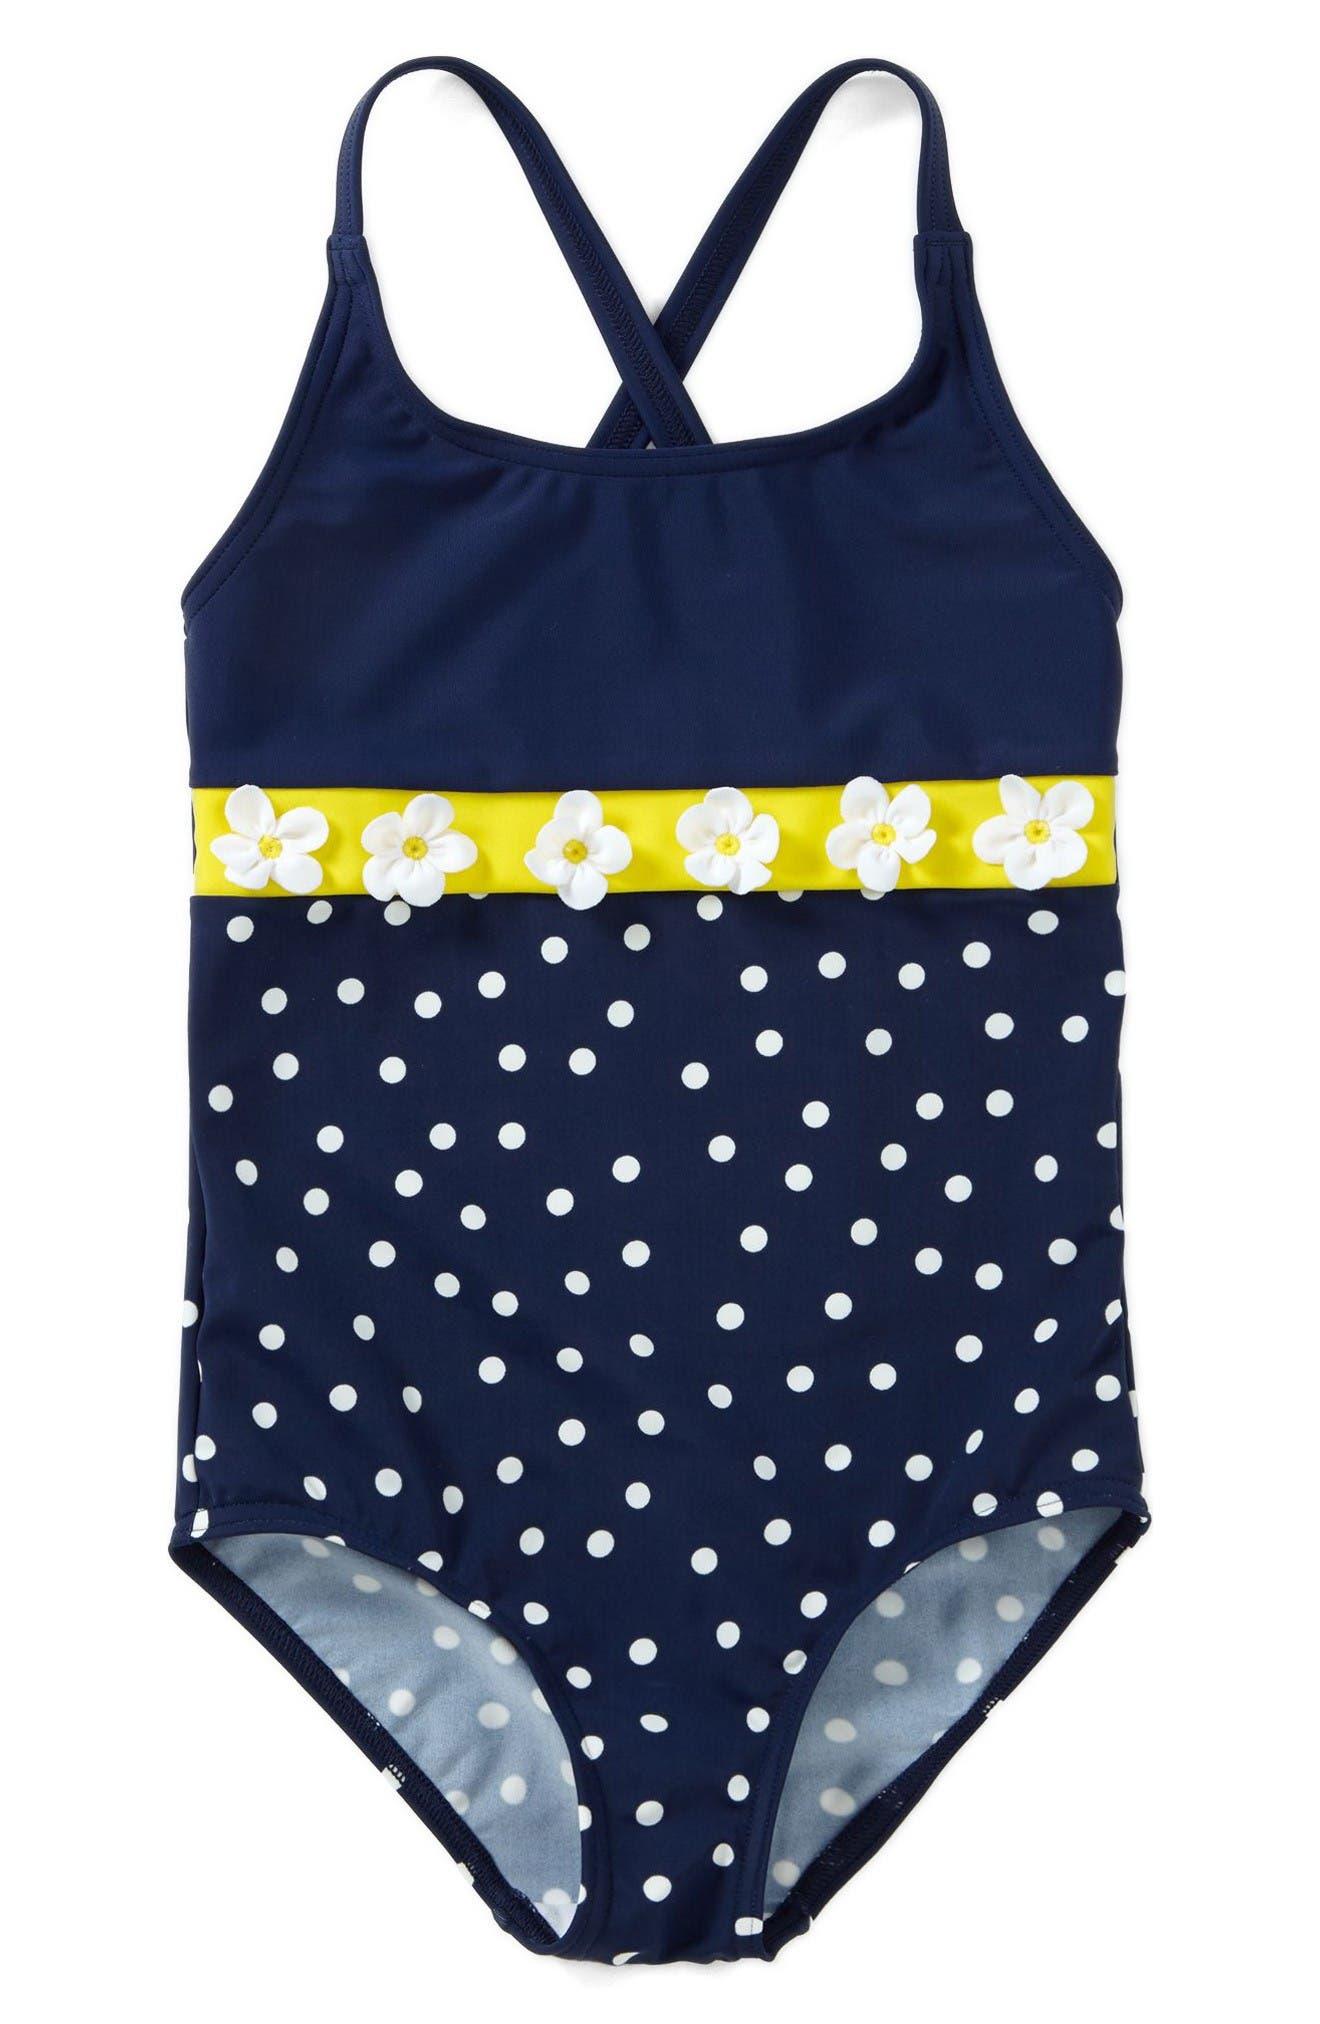 Alternate Image 1 Selected - Mini Boden One-Piece Swimsuit (Toddler Girls, Little Girls & Big Girls)